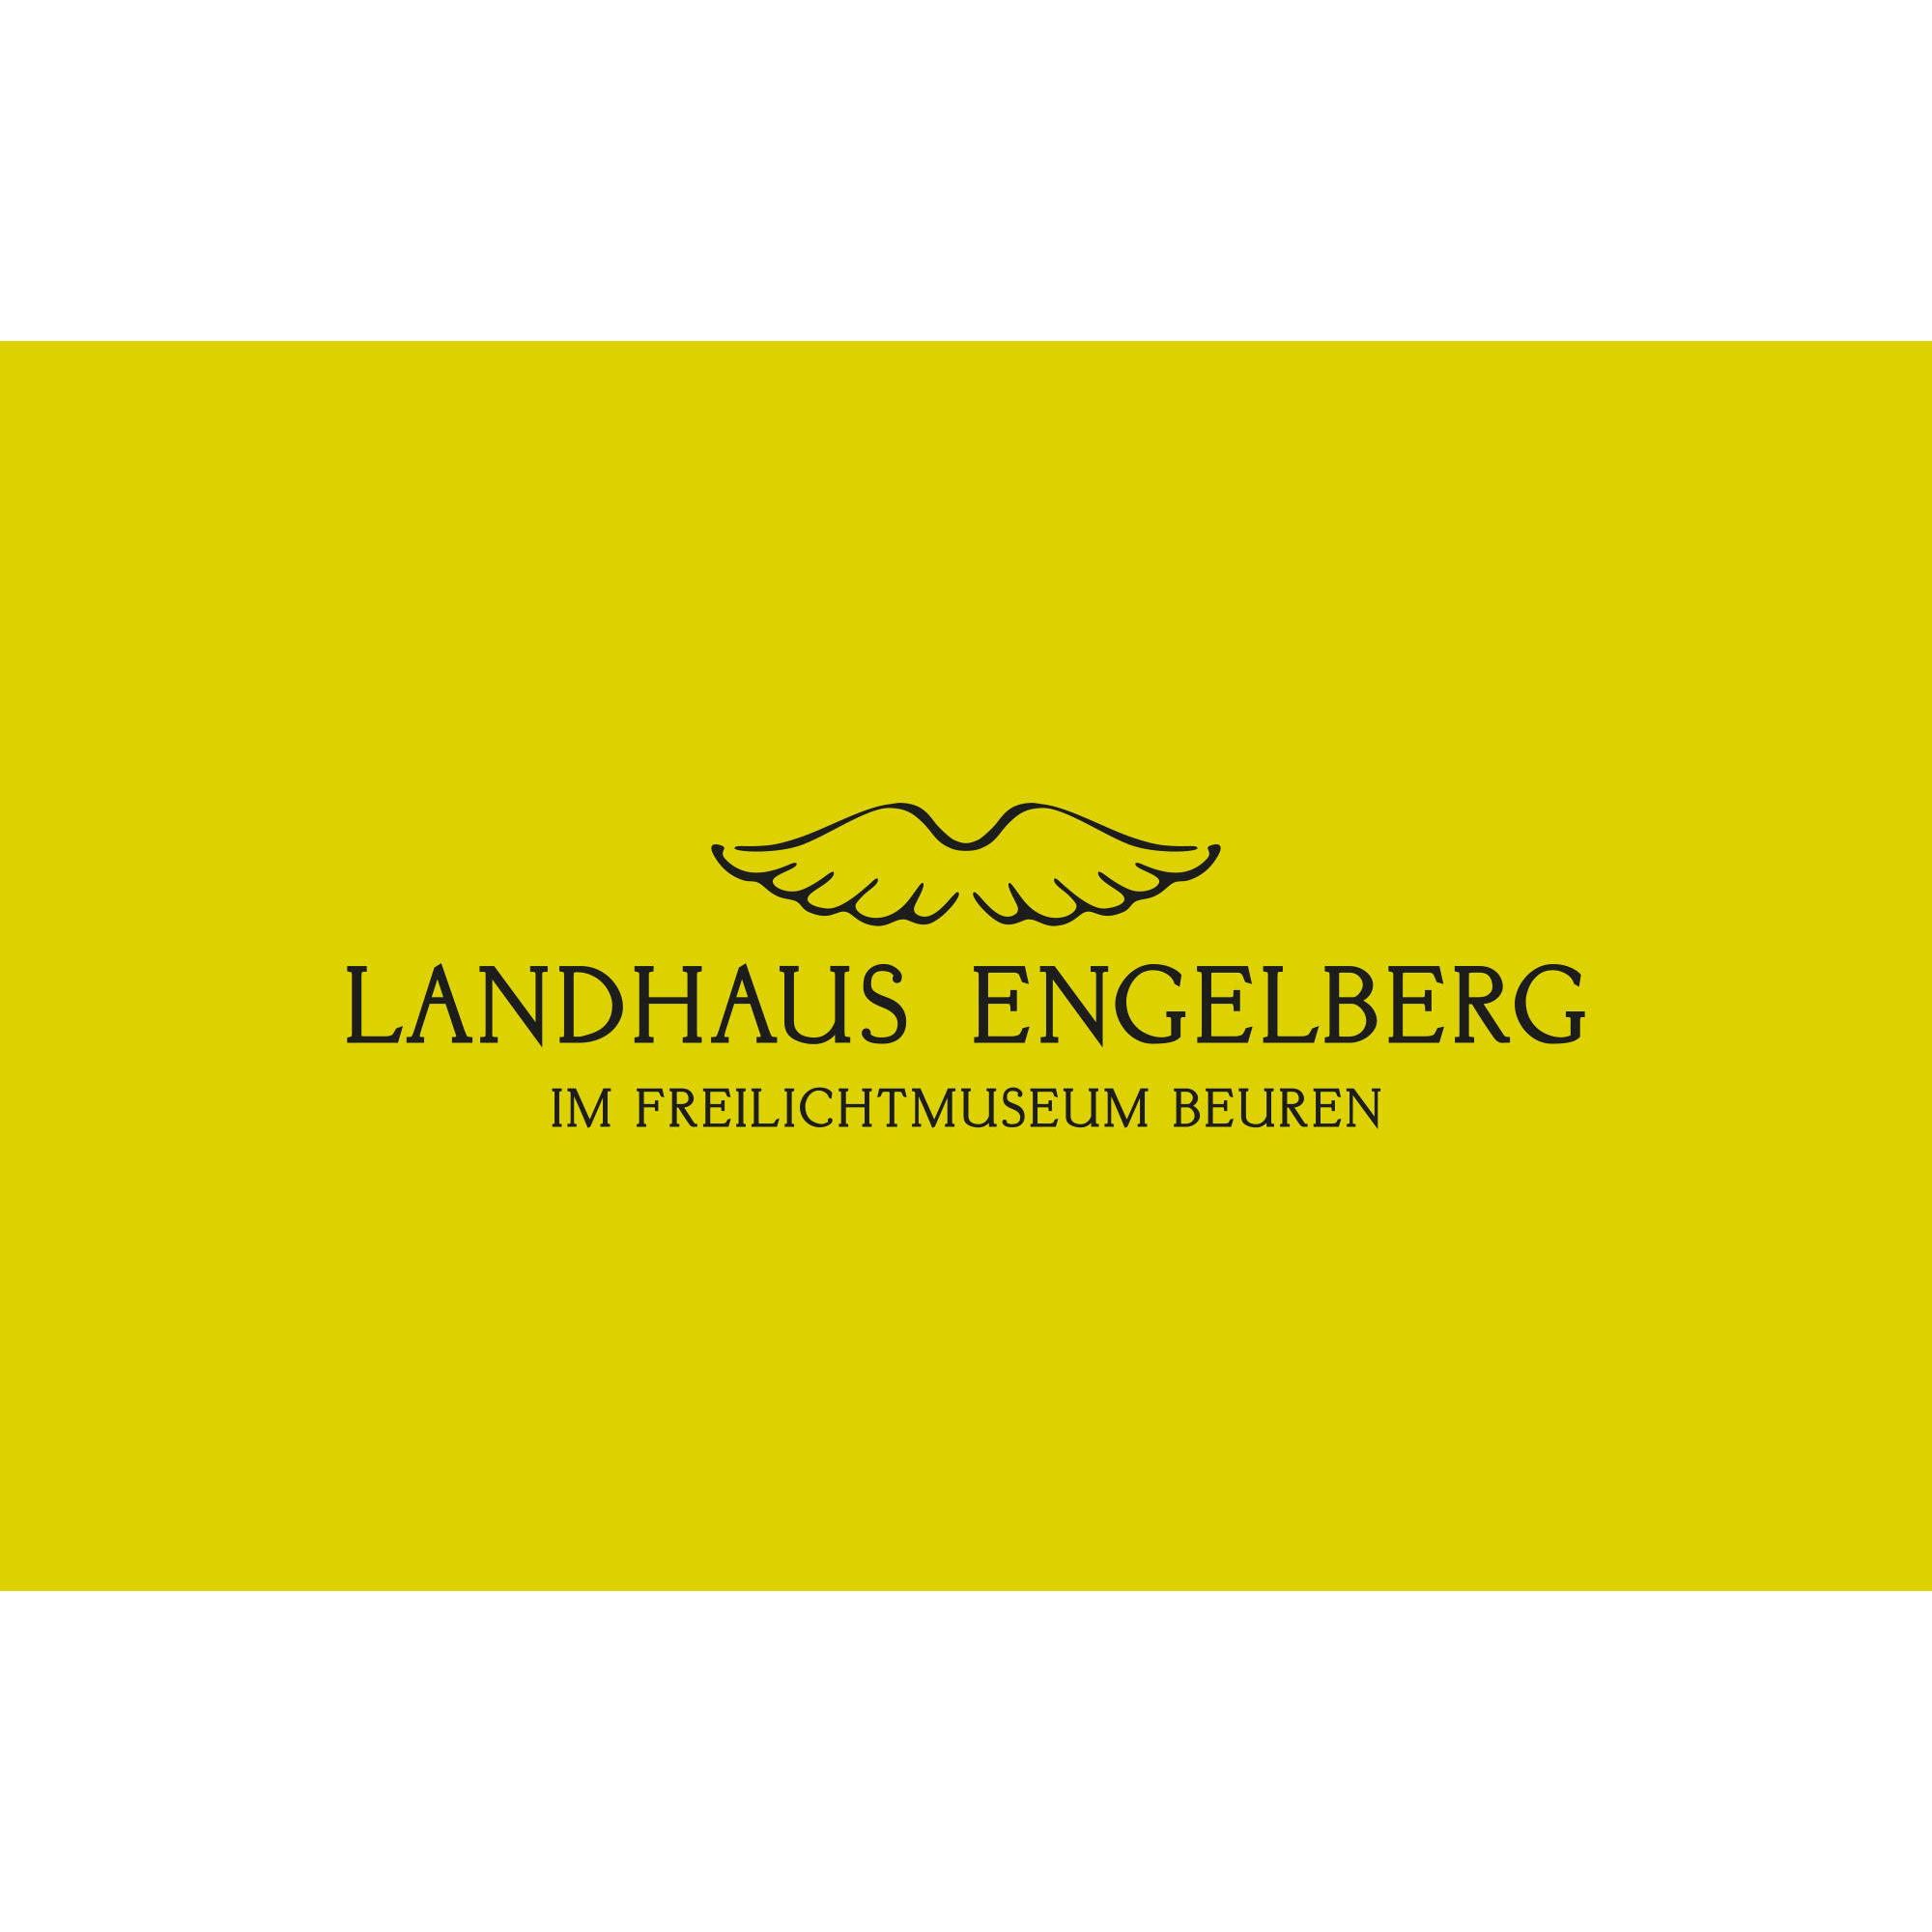 Bild zu Landhaus Engelberg, Gastronomie im Freilichtmuseum Beuren in Beuren bei Nürtingen